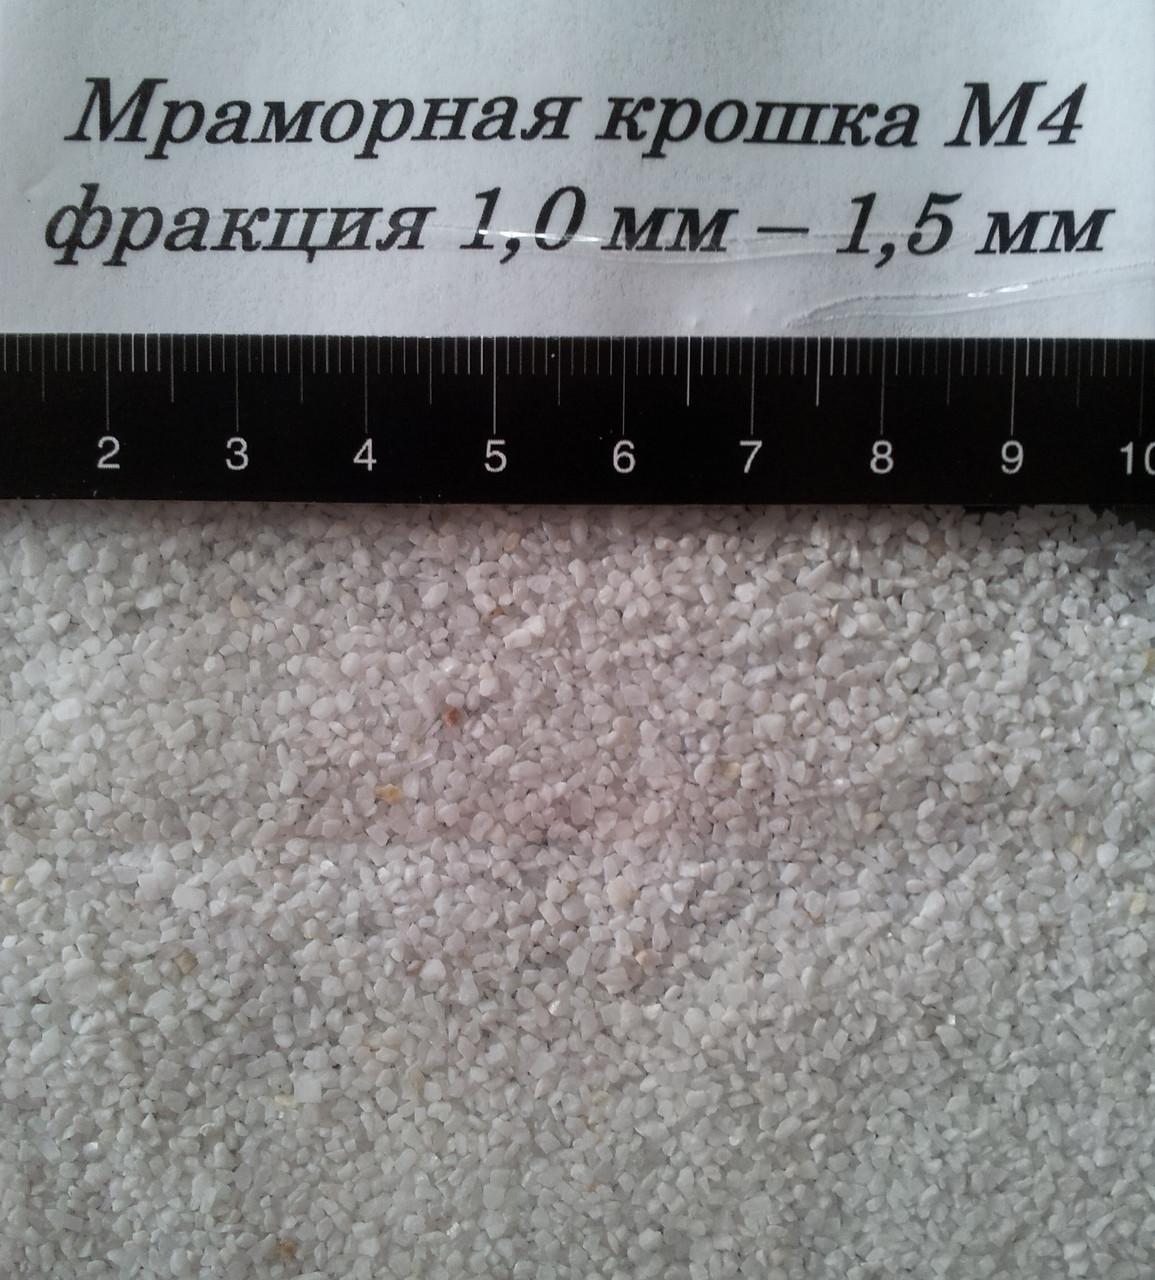 Мраморная крошка Nigtas М4 (1,0-1,5 мм) 40 кг